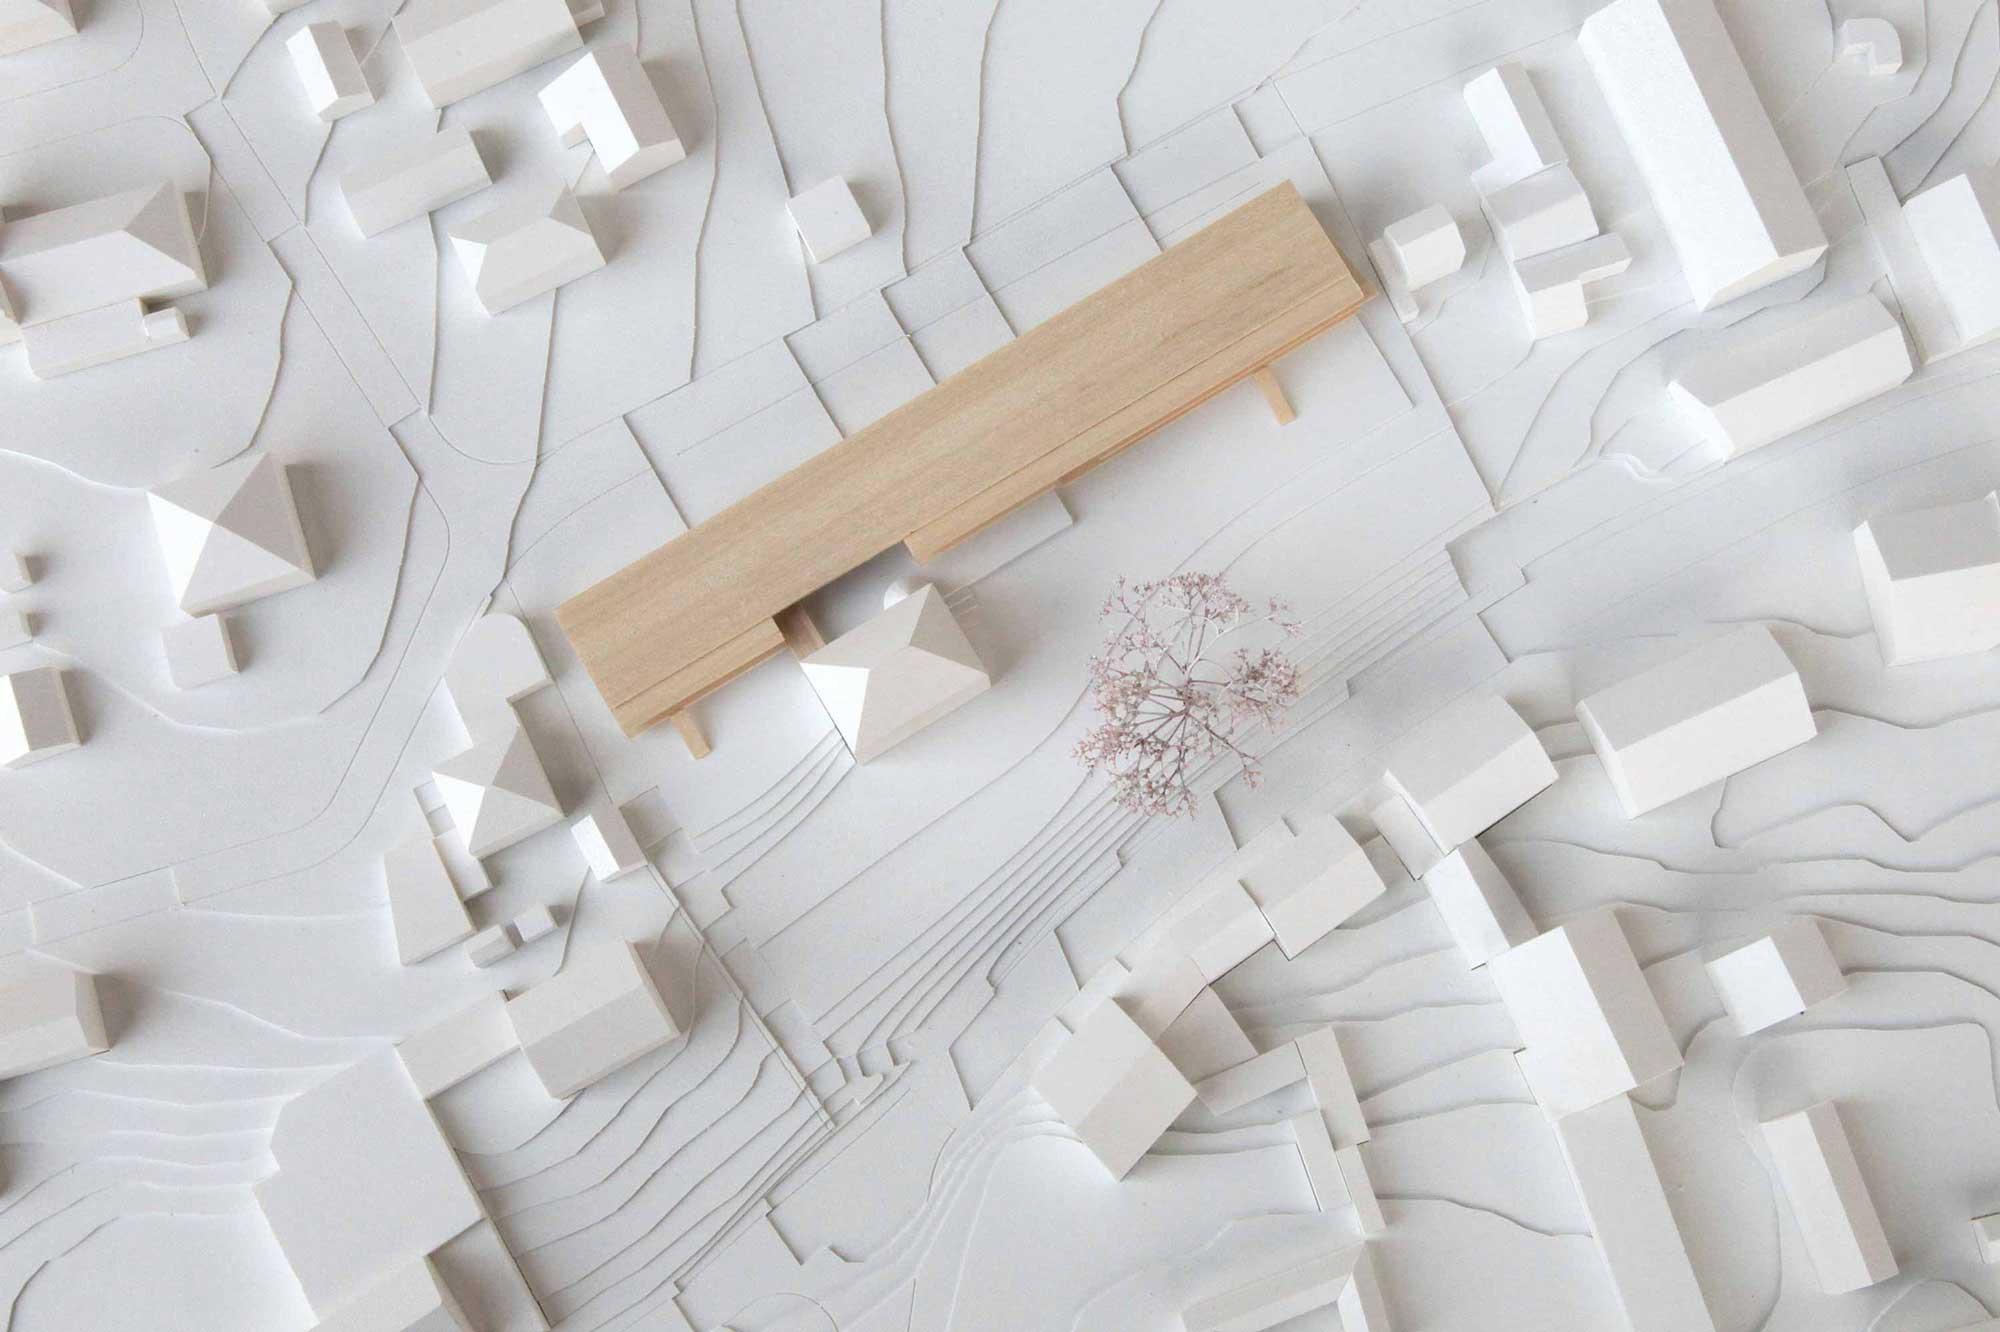 Wettbewerbsmodell Holz Familienhaus EbersbergAufsicht